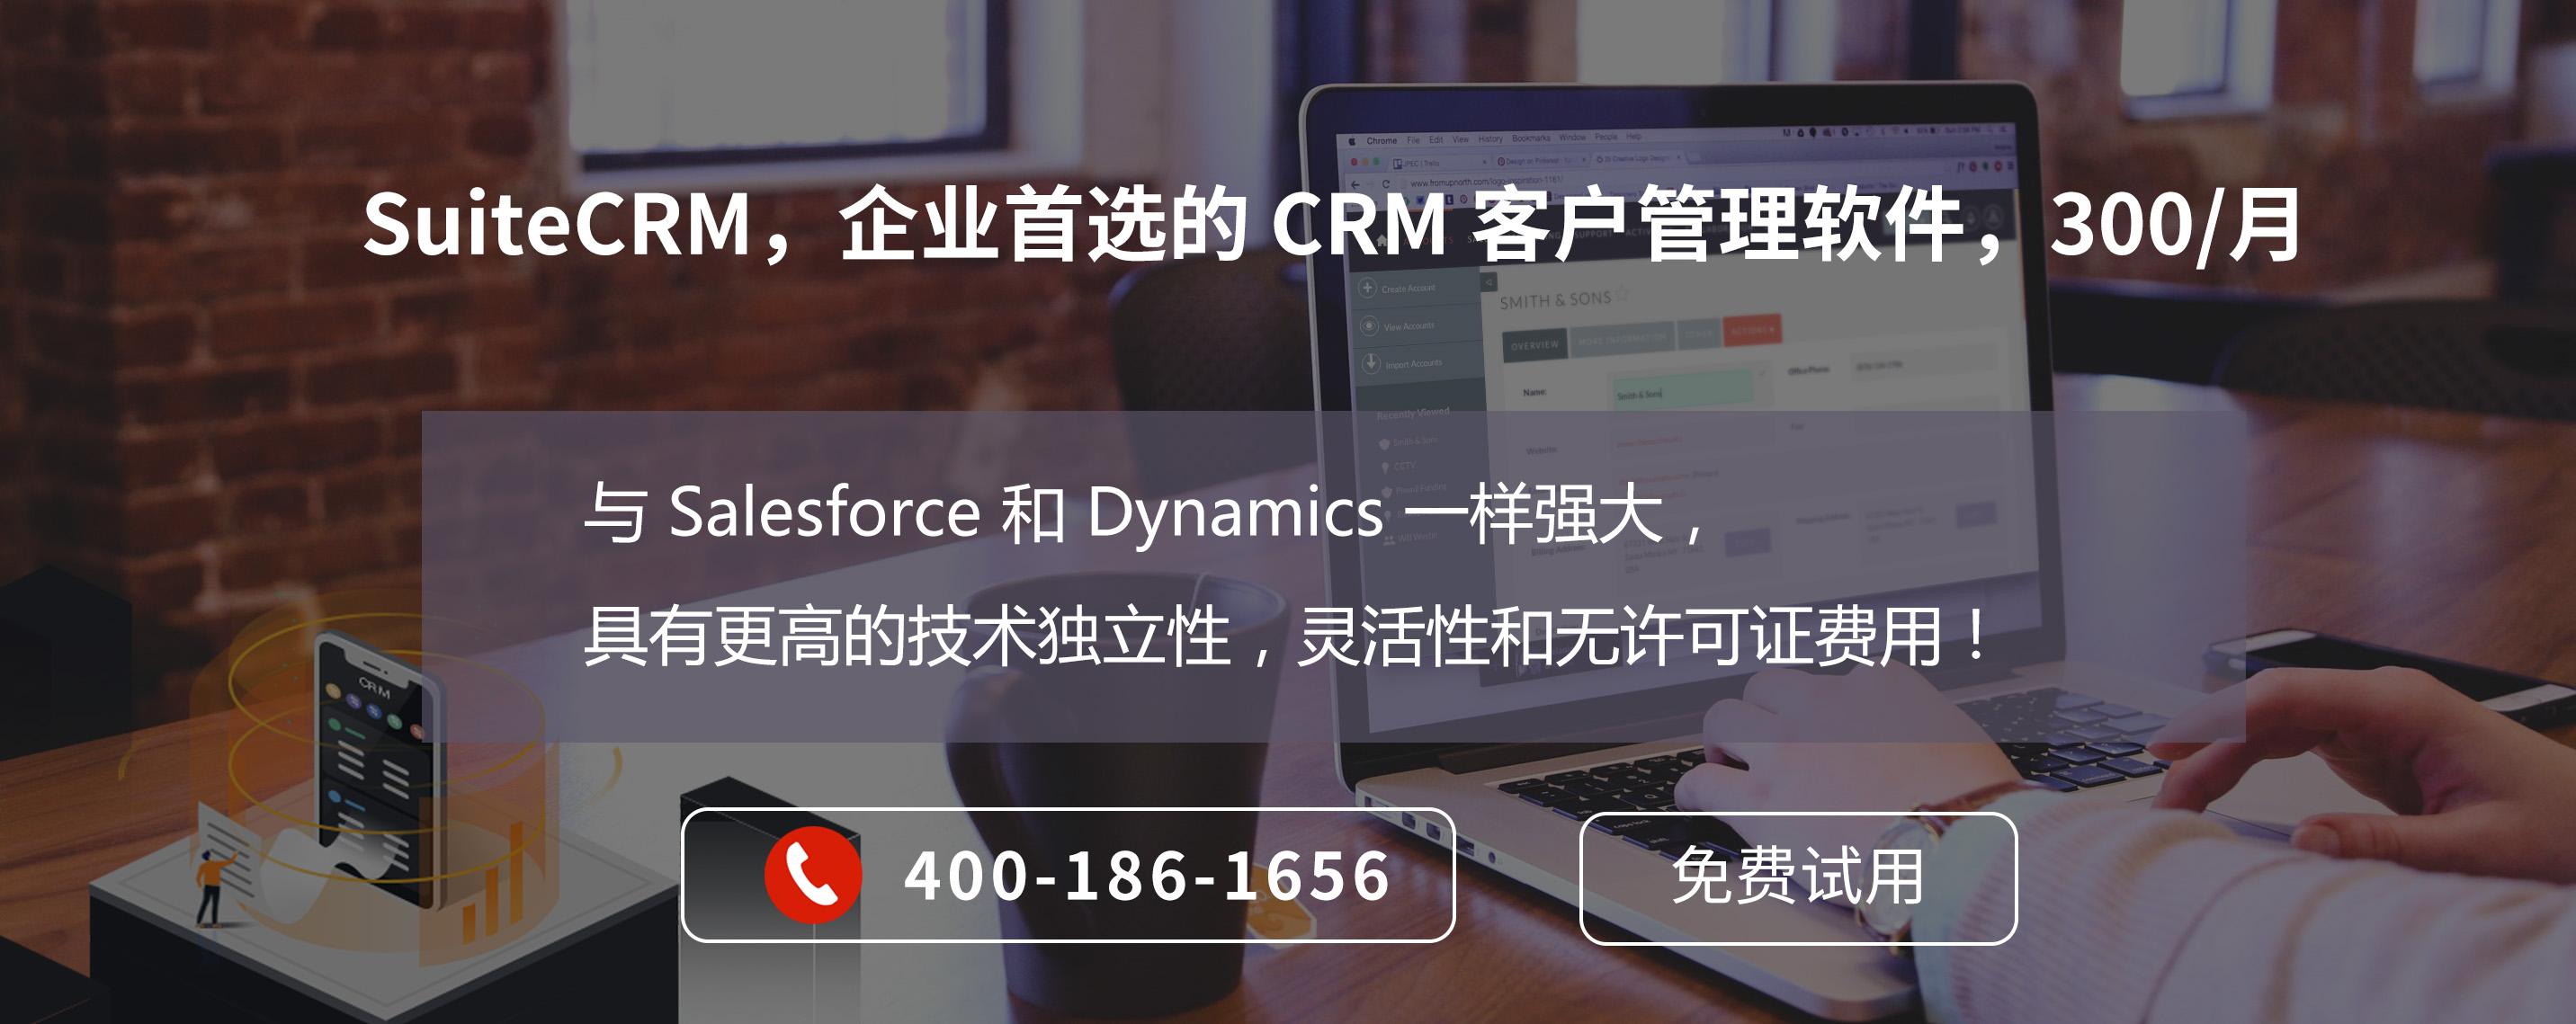 crm免费试用,crm哪个软件好,crm软件比较,crm软件费用,crm软件购买